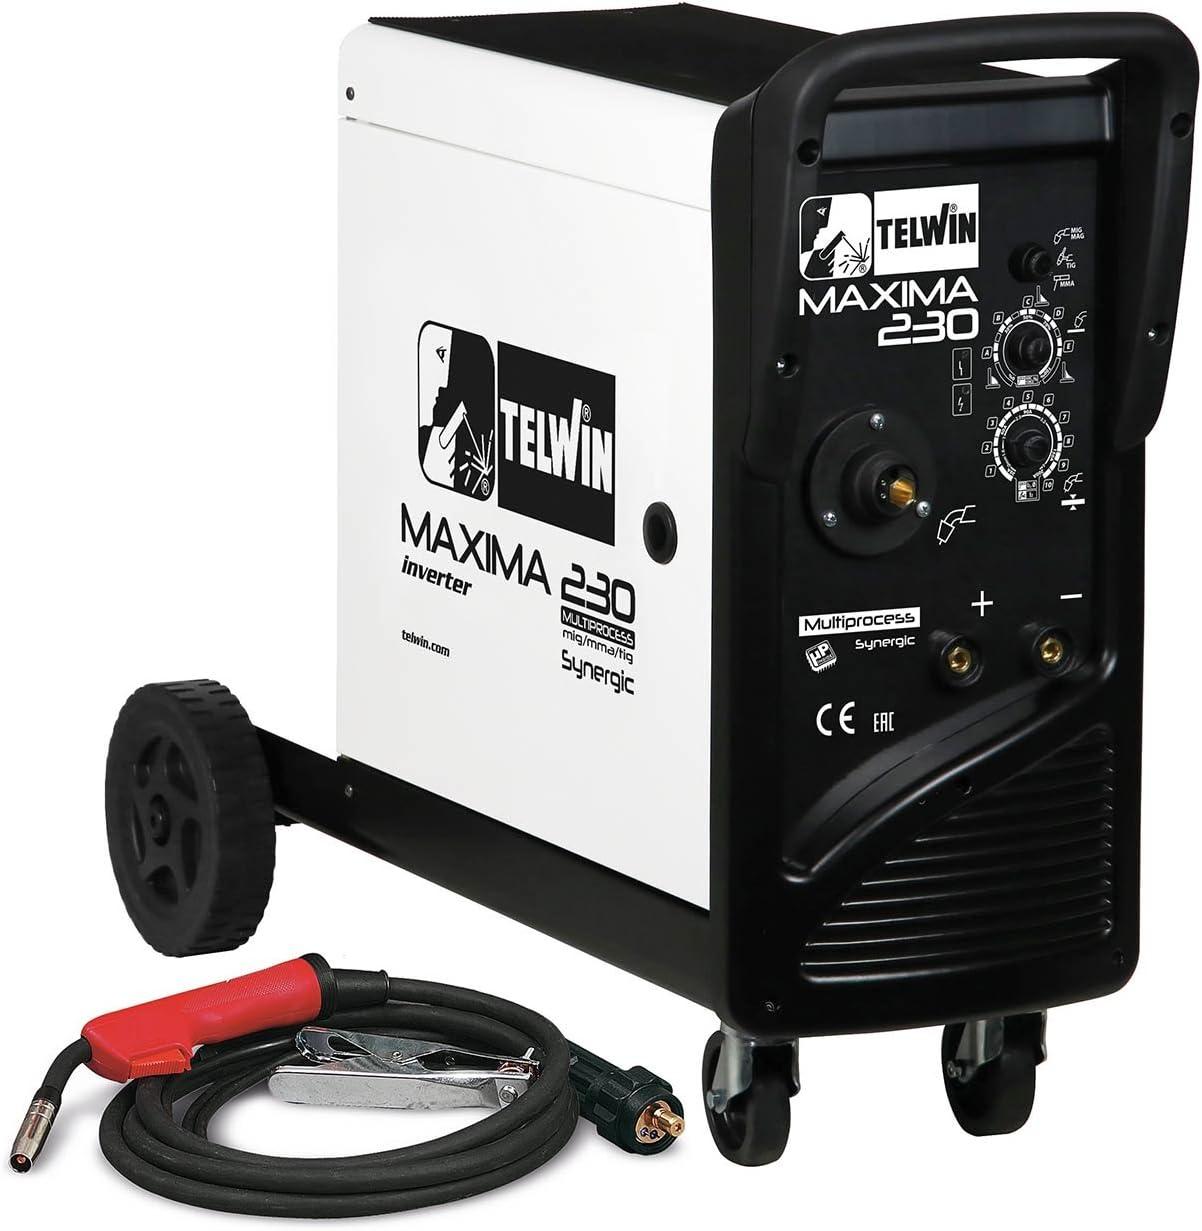 Telwin 816088 maxima 230